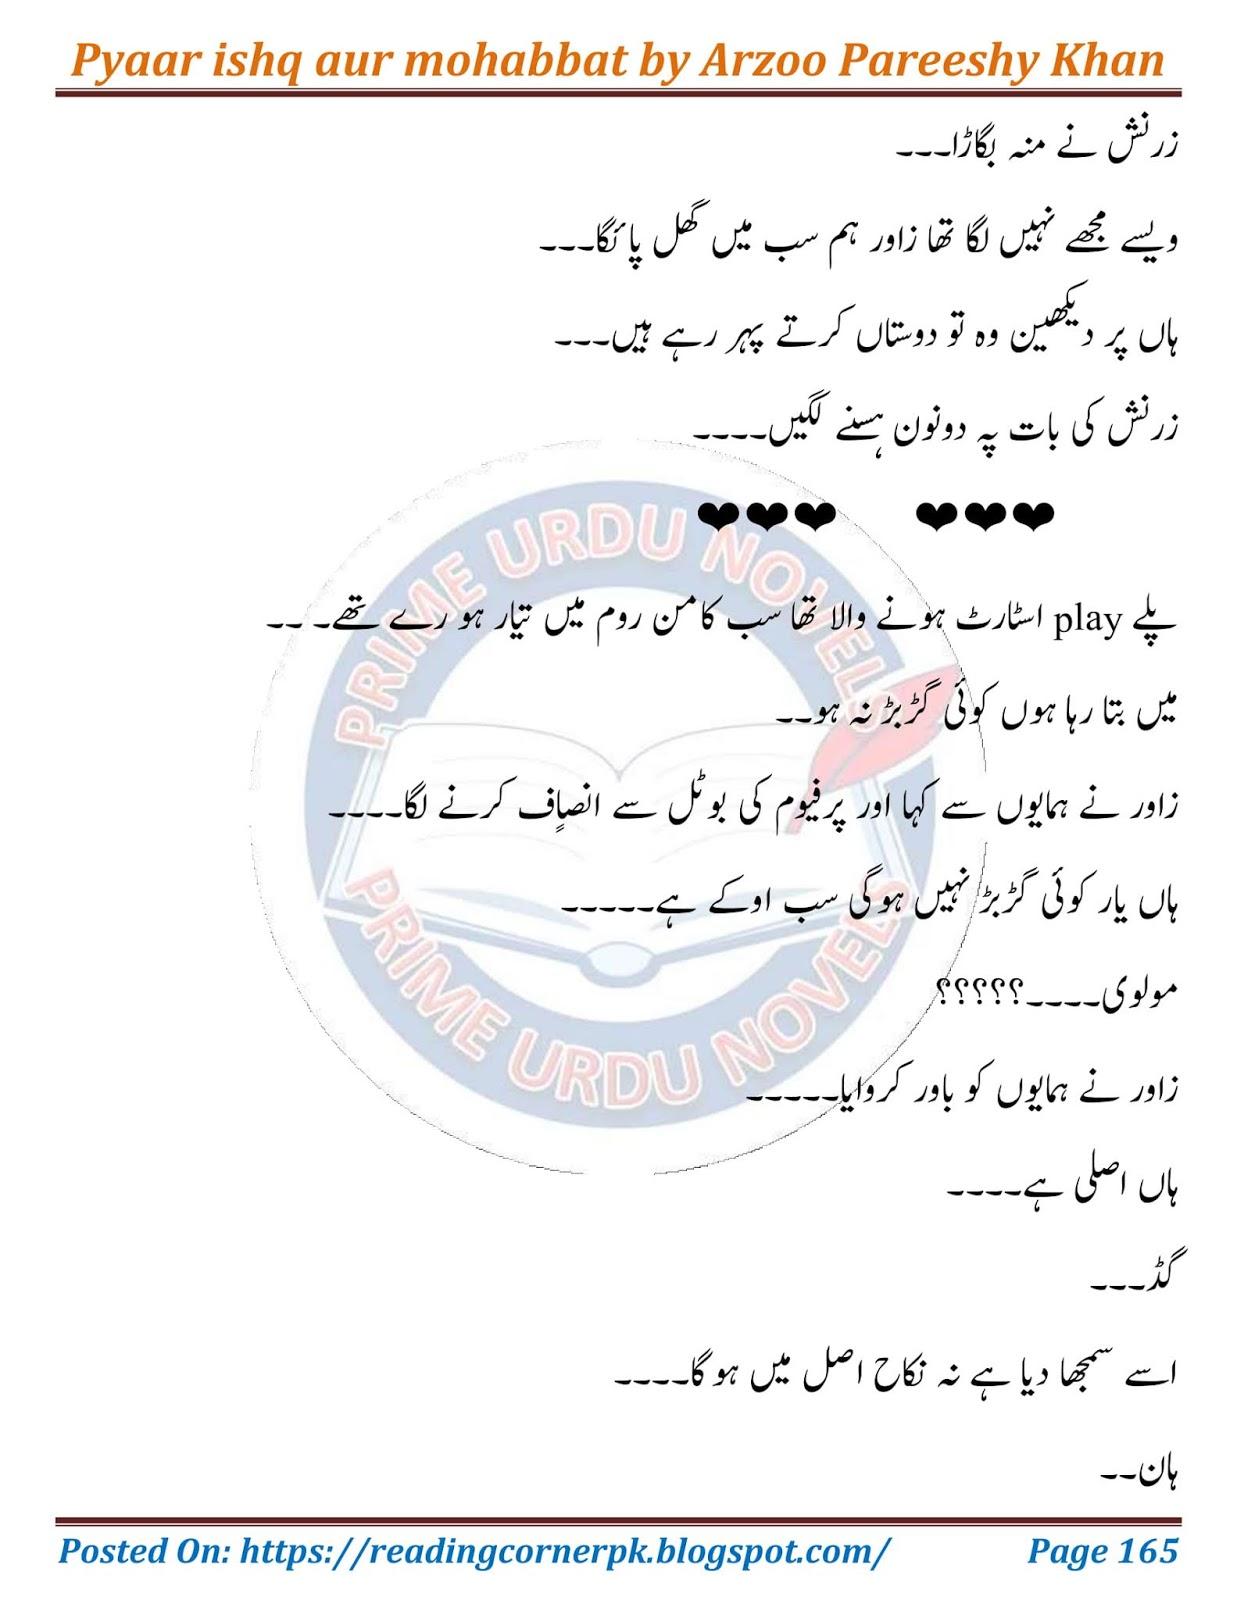 PRIME ONLINE NOVELS: Pyaar ishq aur mohabbat by Arzu Pareeshy Khan